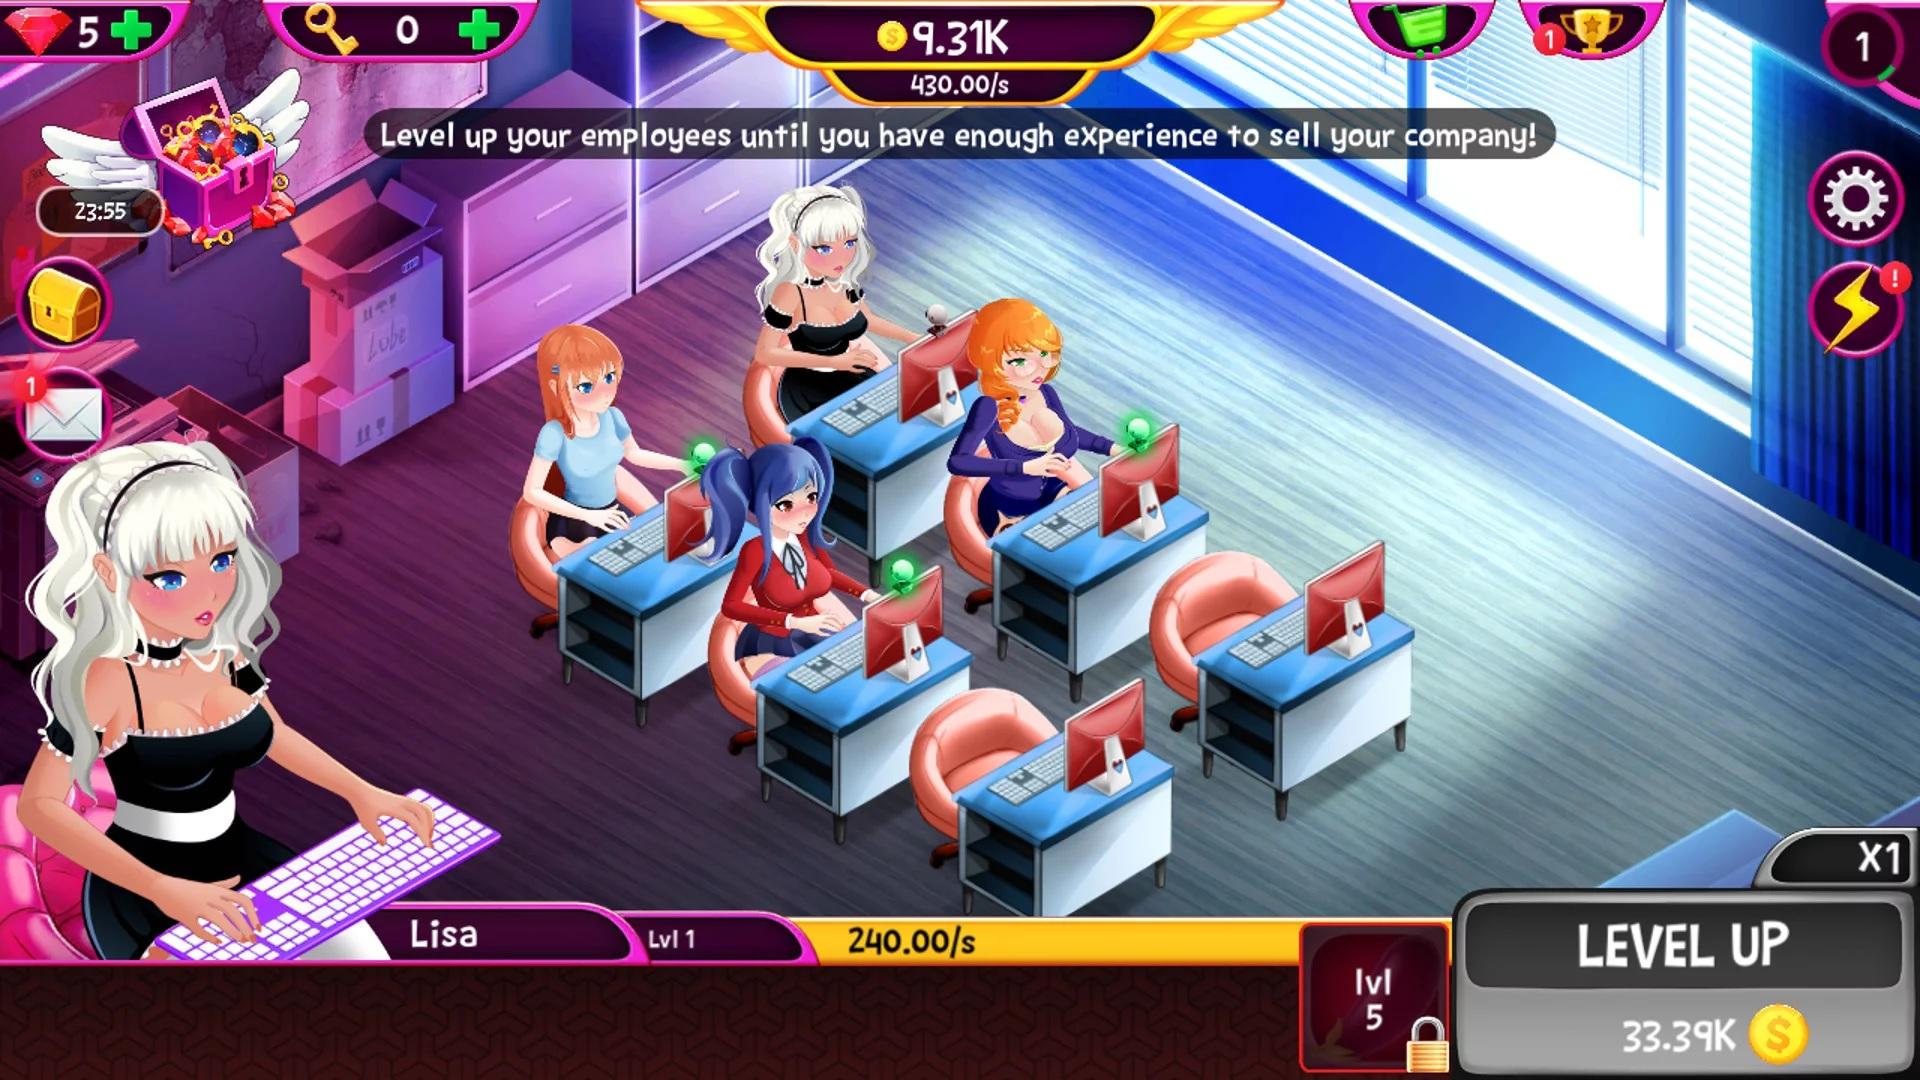 Best game on nutaku